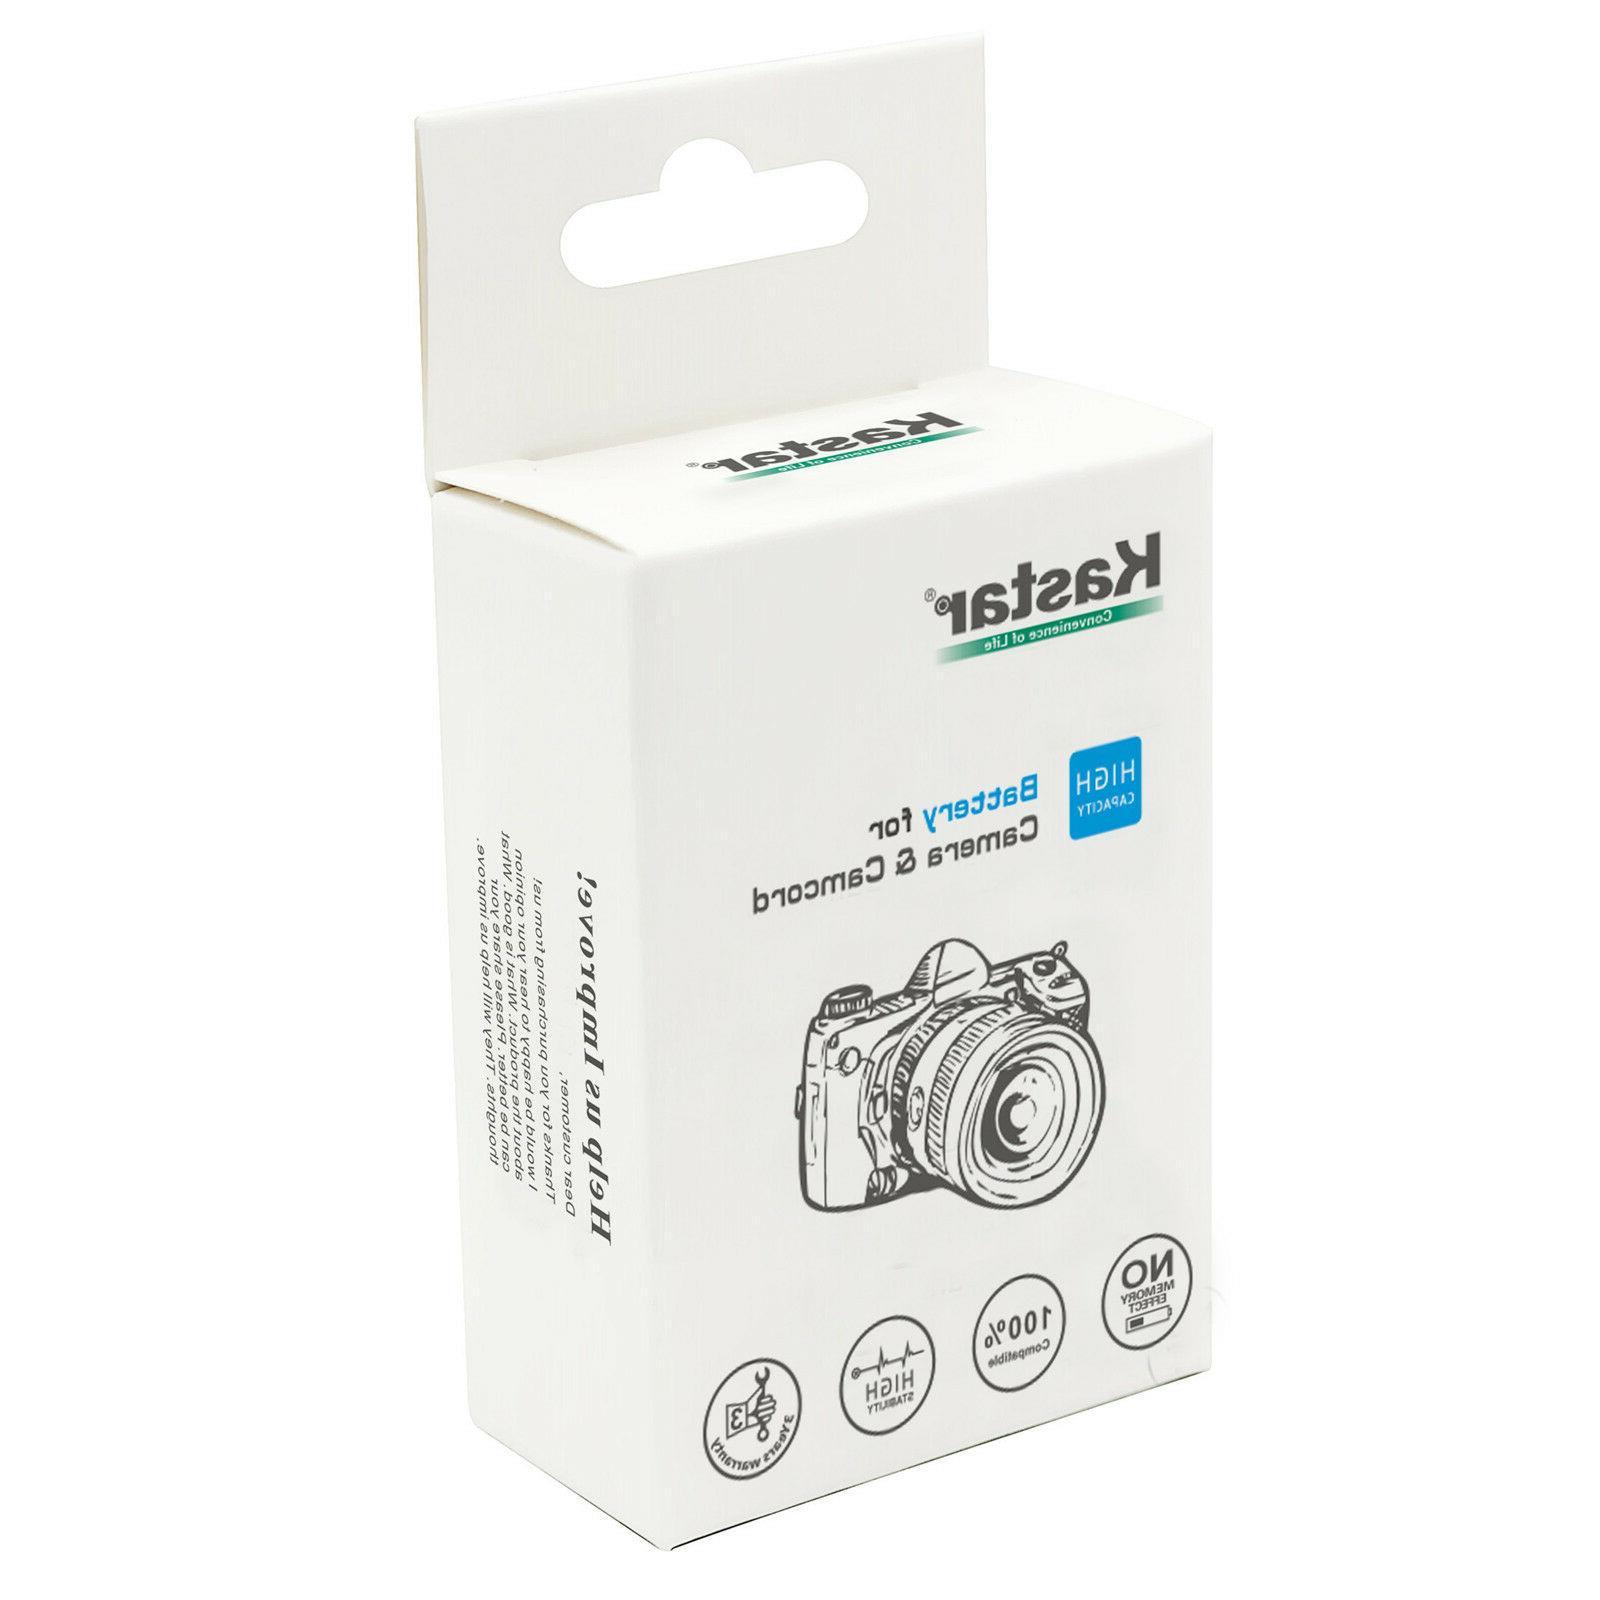 Kastar Charger Nikon SLR Digital Camera